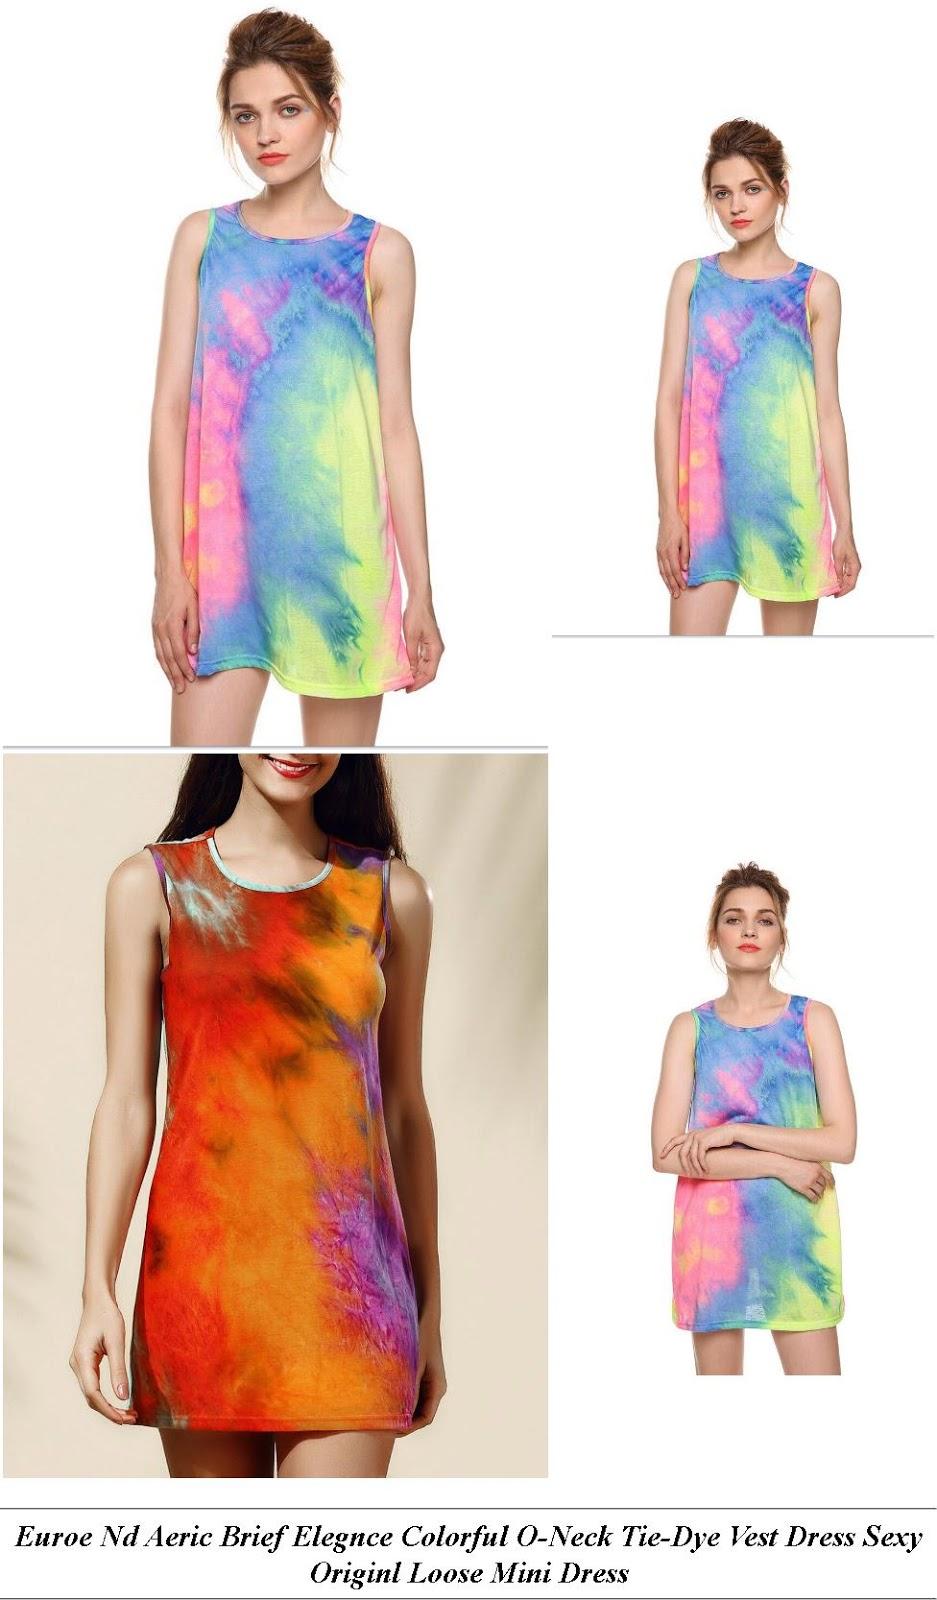 Beach Wedding Dresses - Baby Sale Uk - Black Dress - Cheap Clothes Online Shop